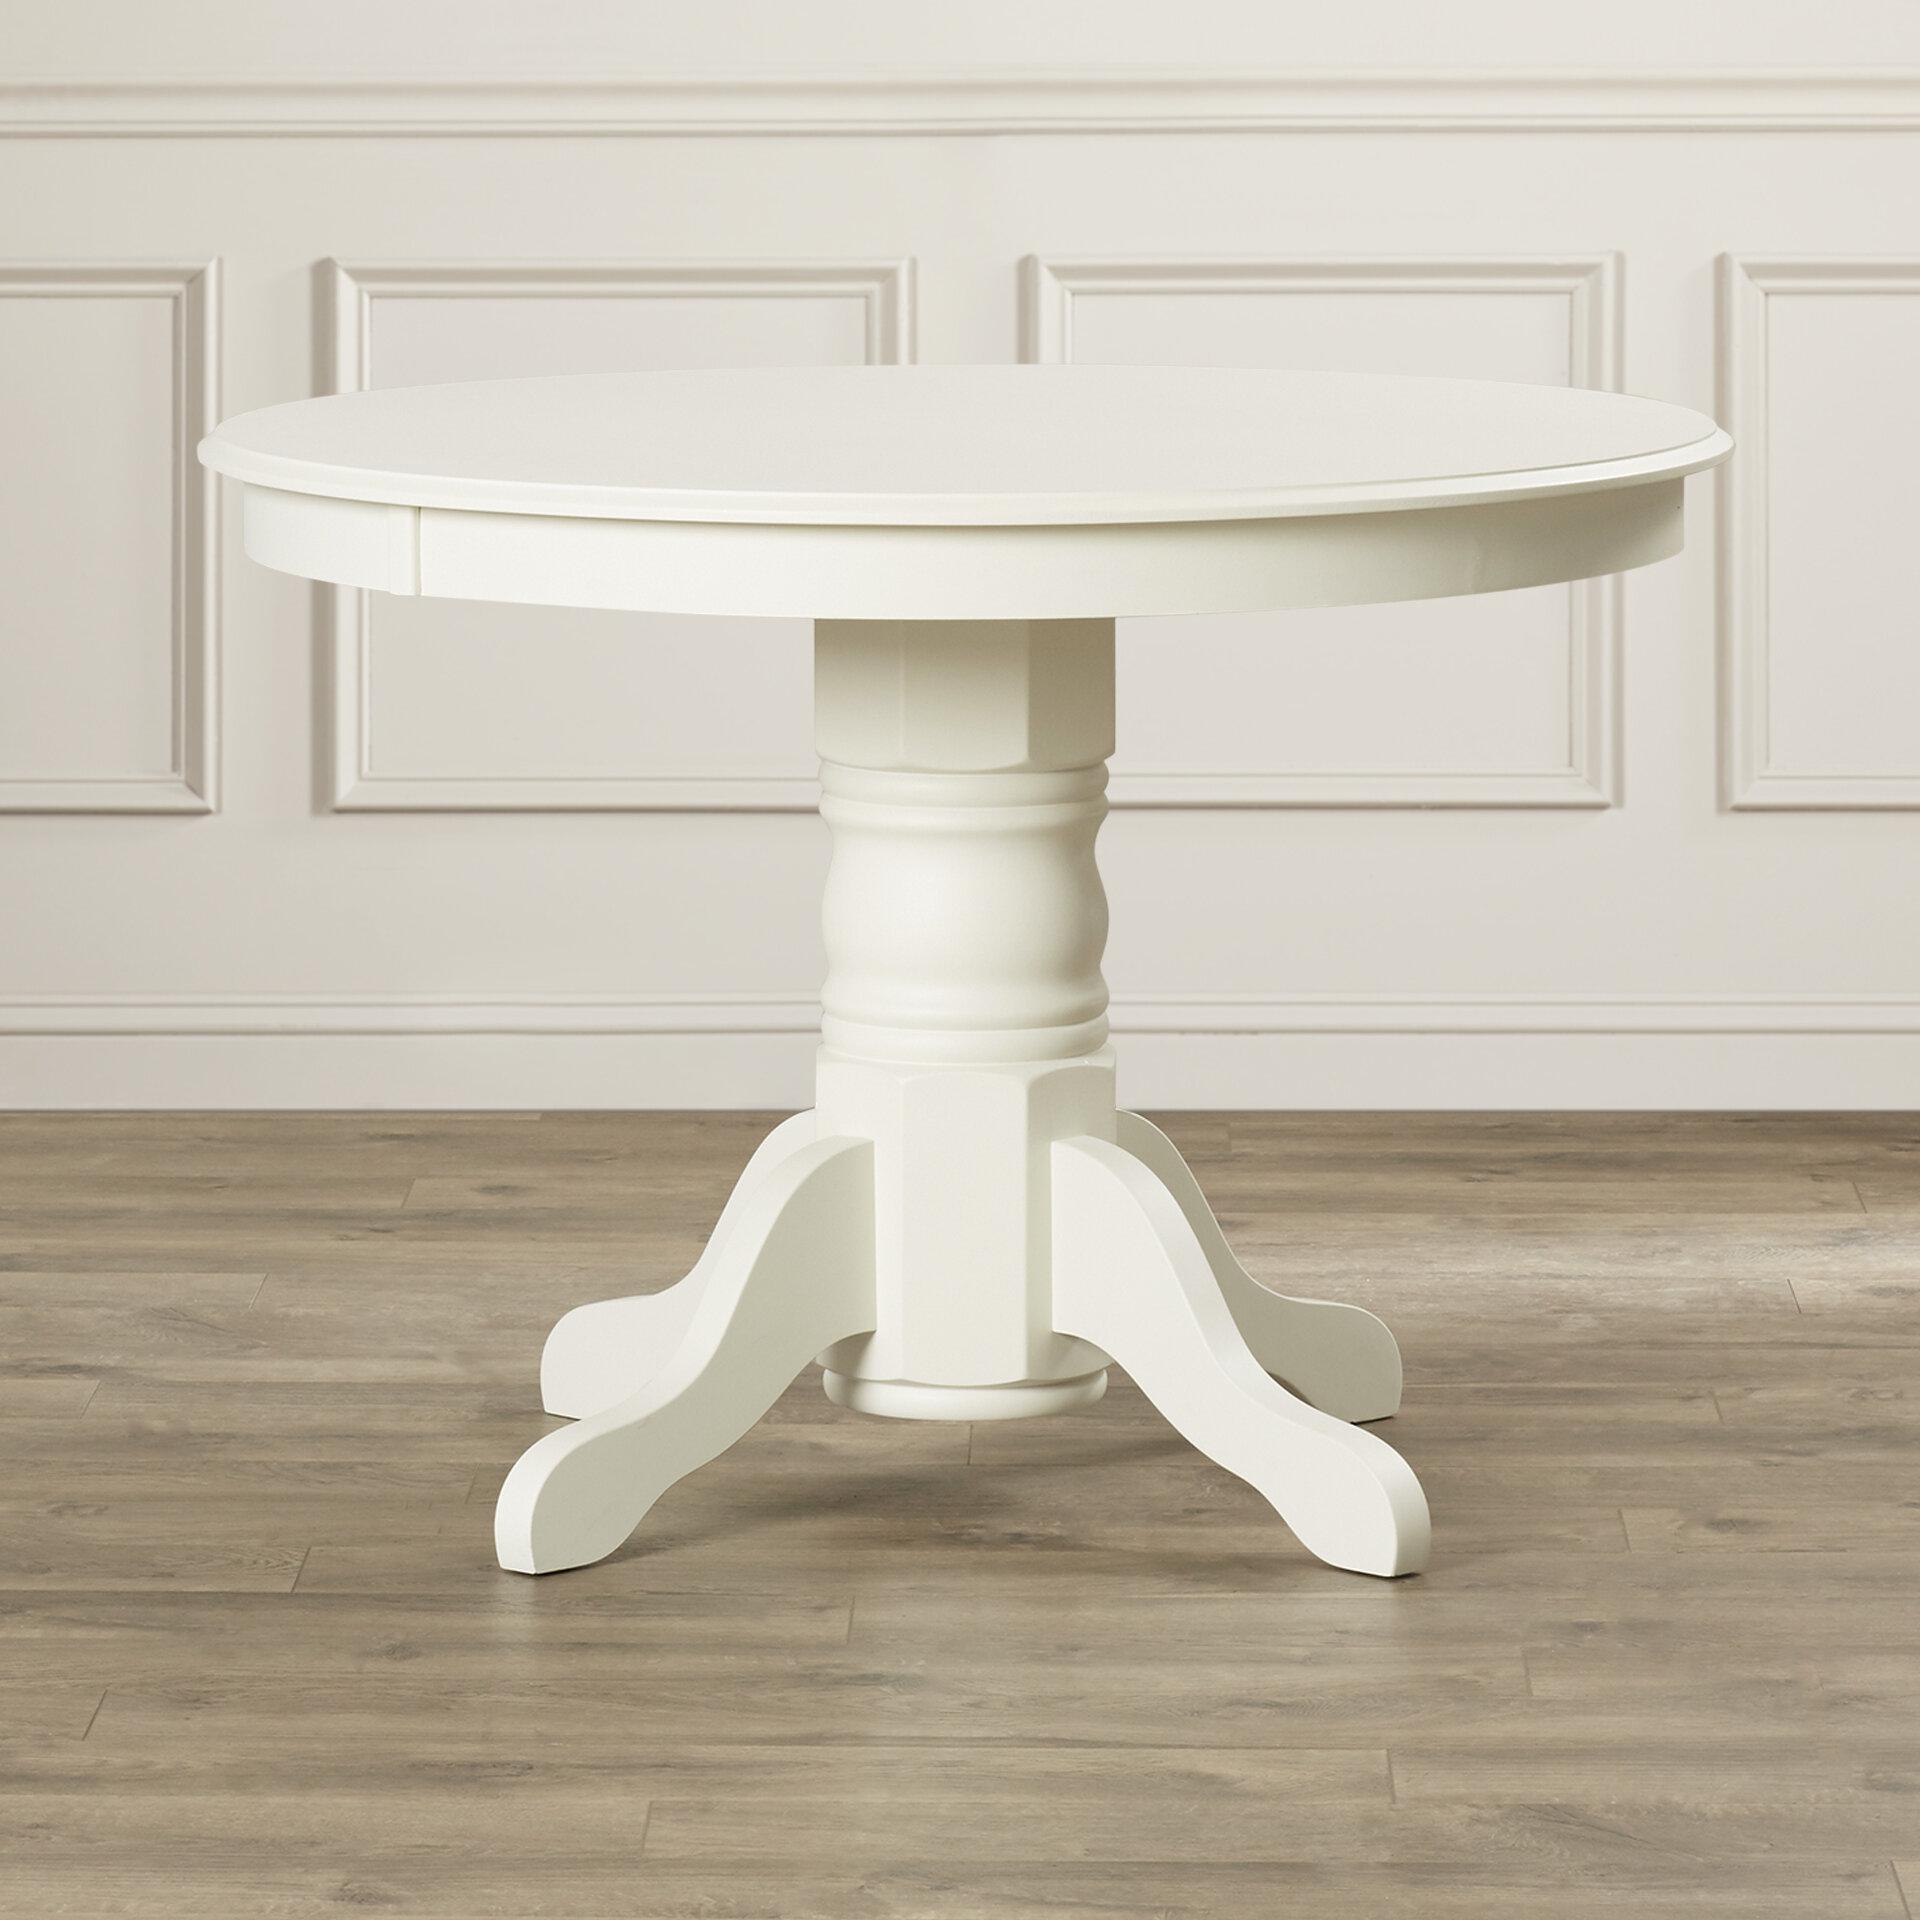 Standridge 9'' Solid Wood Pedestal Dining Table